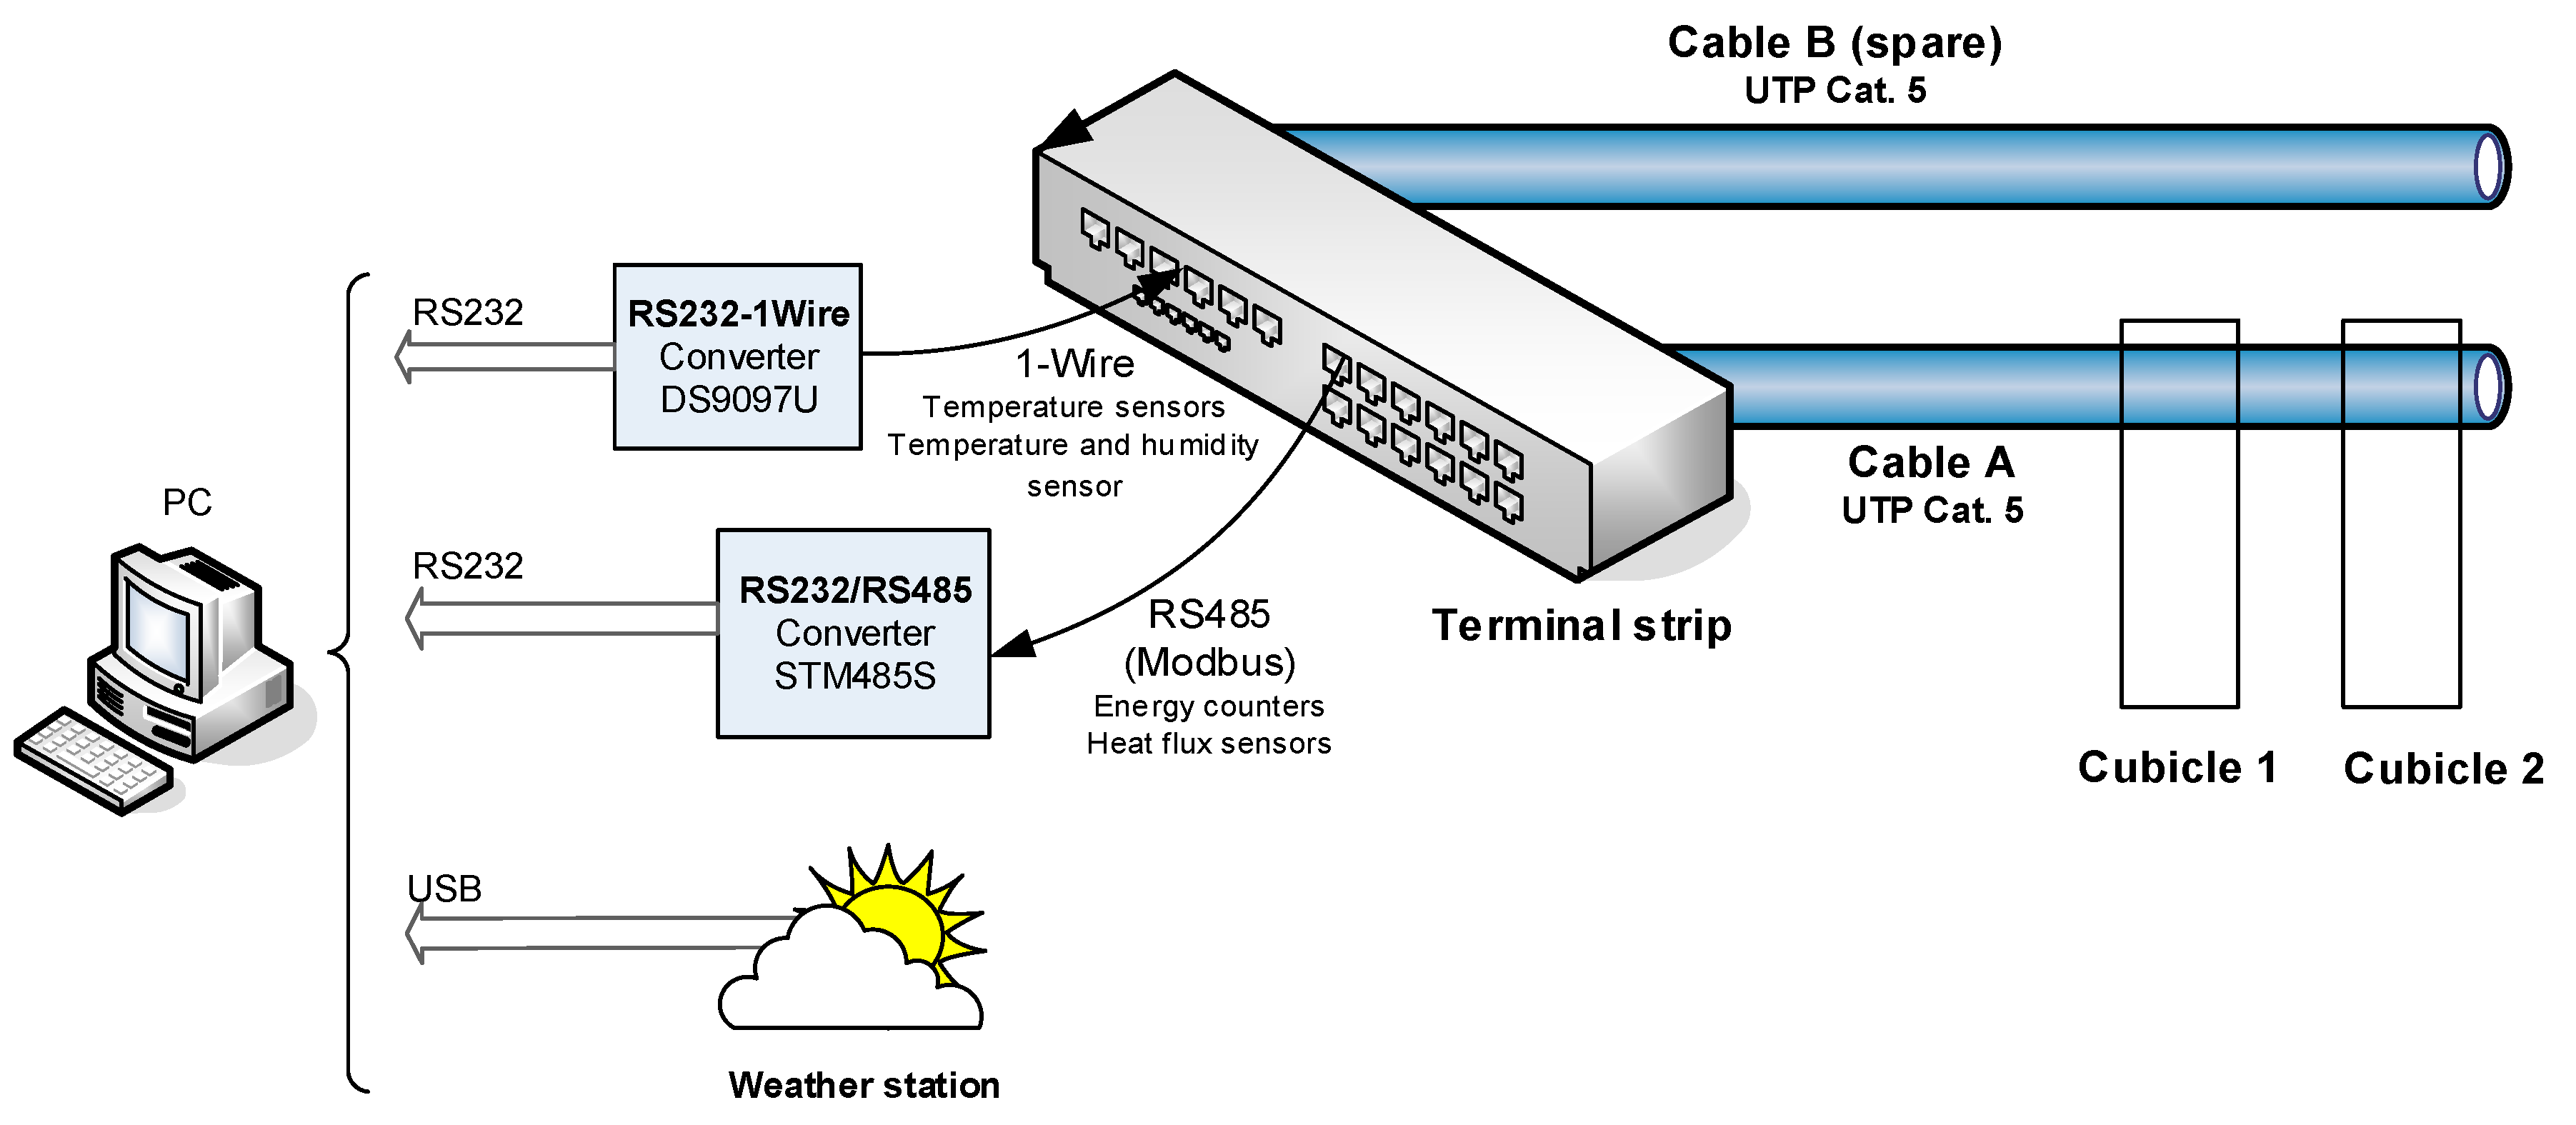 Hk Wire Diagram Heat Strip Wiring Diagrams Schematics - Electric heat strip wiring diagram